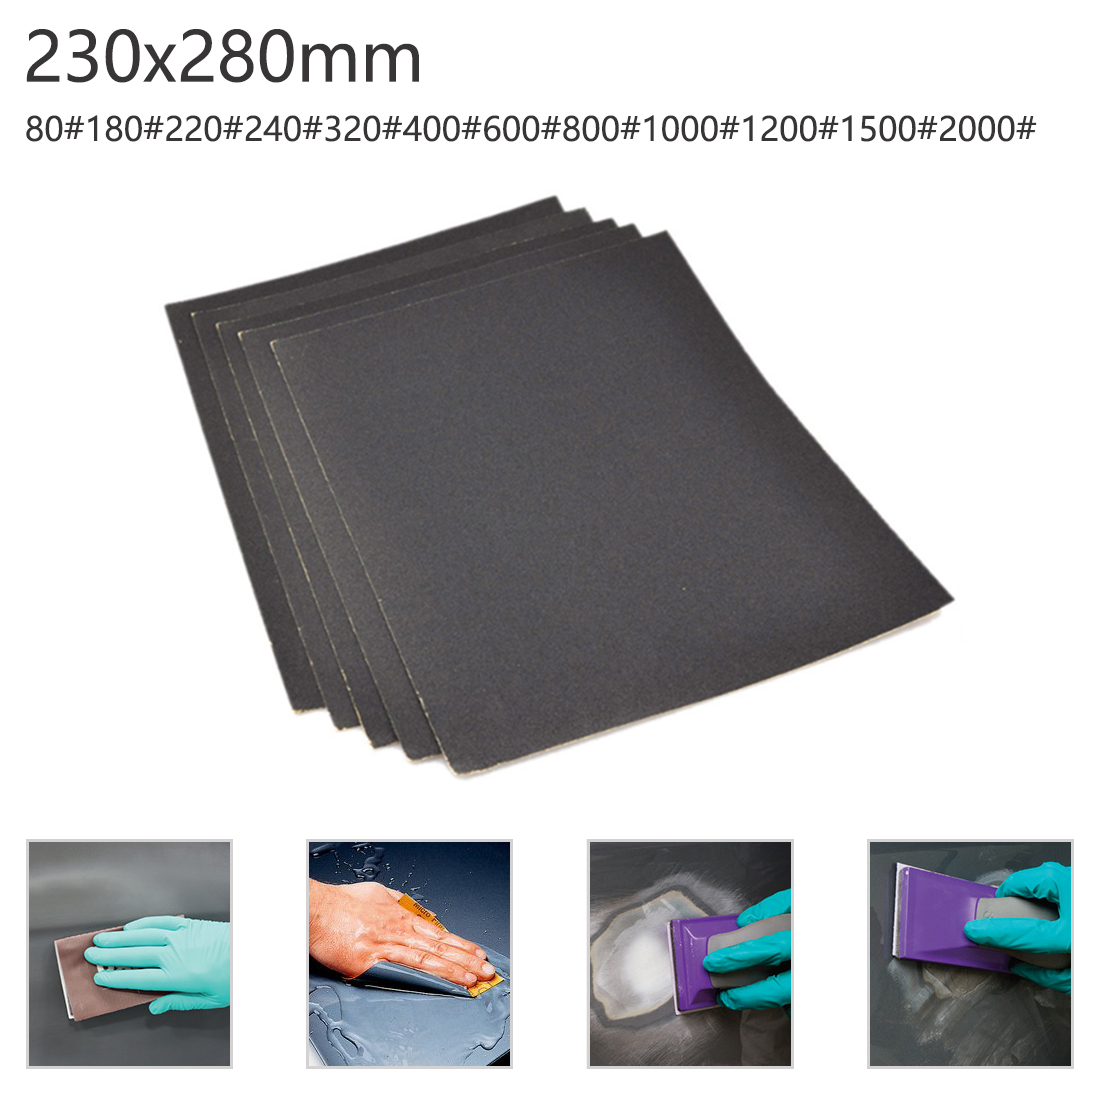 Waterproof Sandpaper Water Sand Paper Polishing Cloth 80-2000 Mesh Water Amber Bodhi Wood Dry Sand